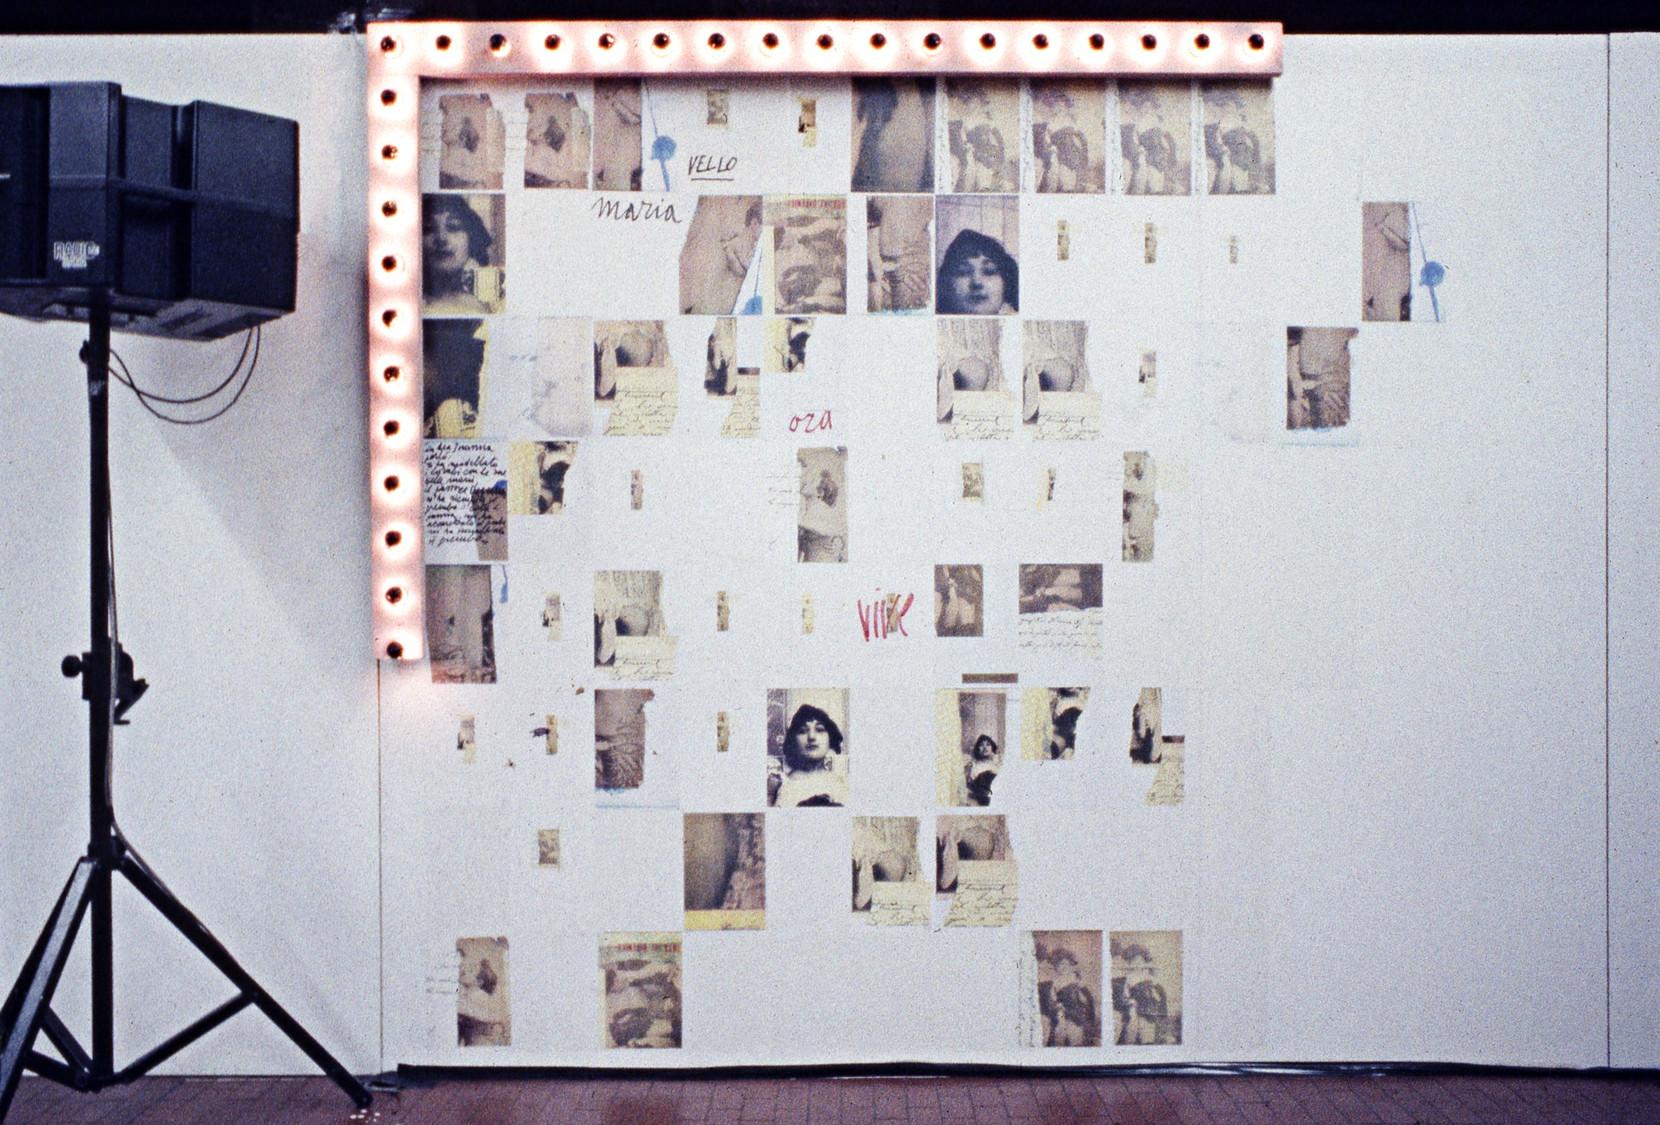 tavola profumata - 1995